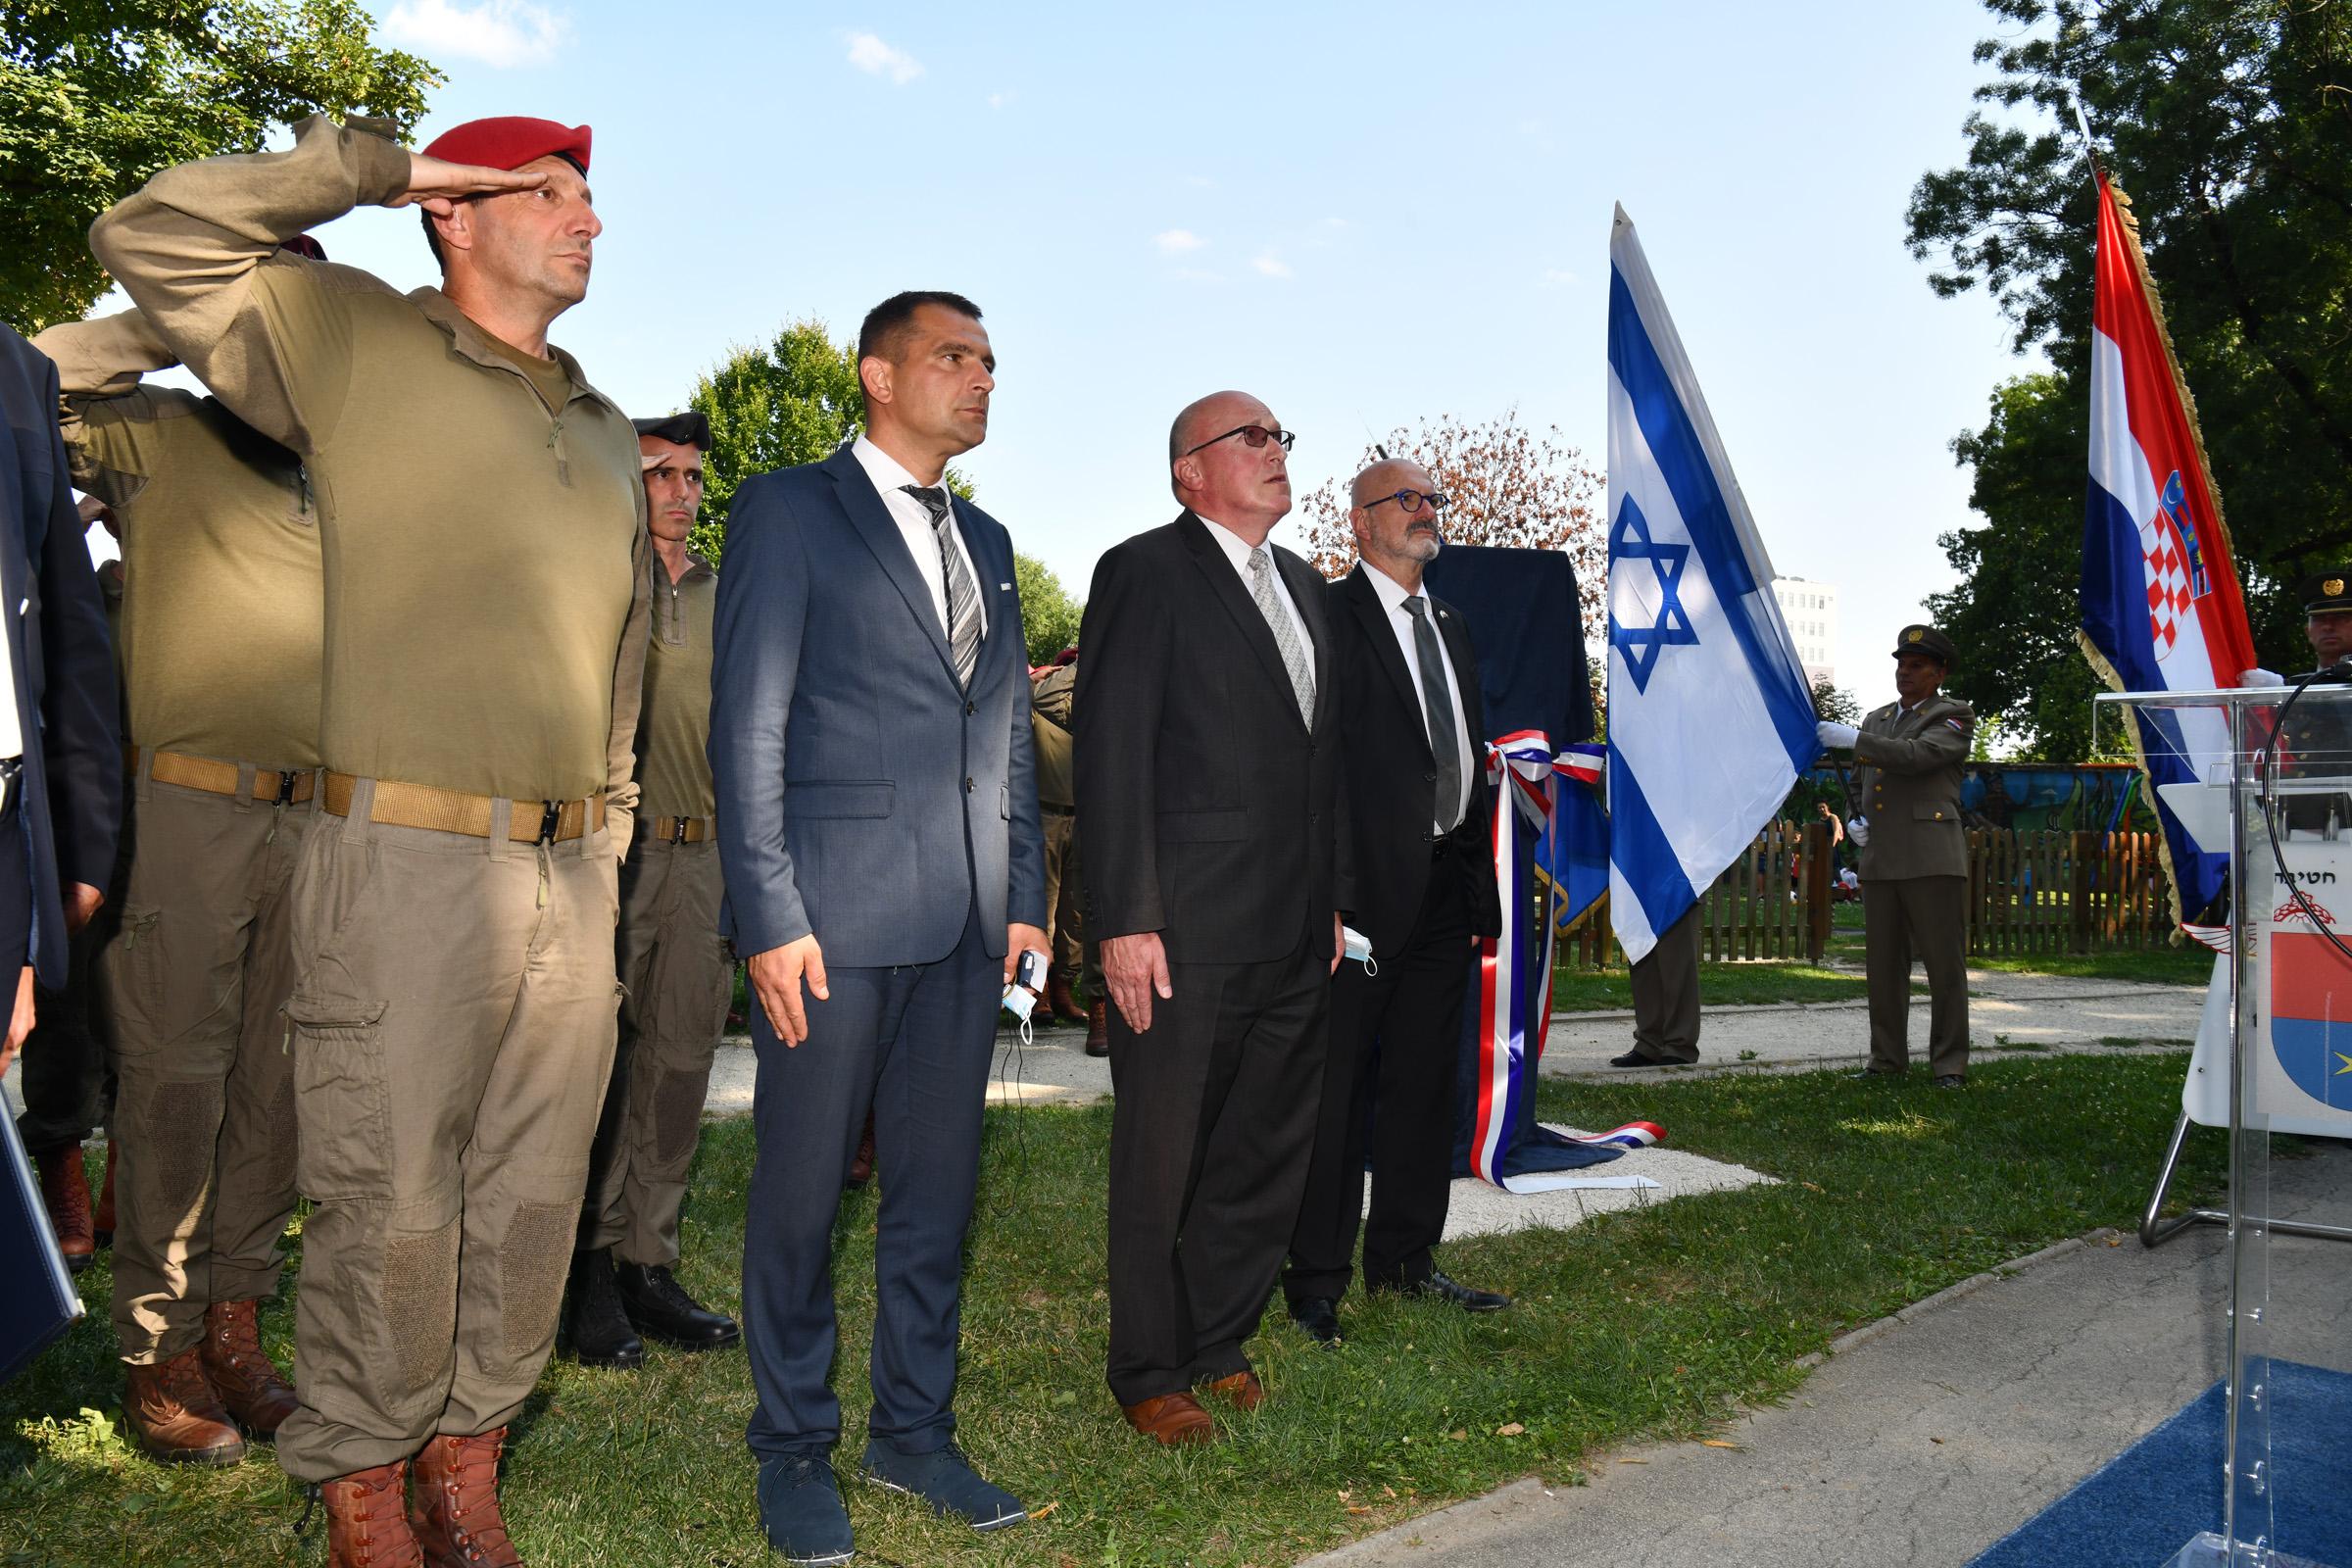 Državni tajnik Jakop na Memorijalnoj hodnji Izraelskih obrambenih snaga